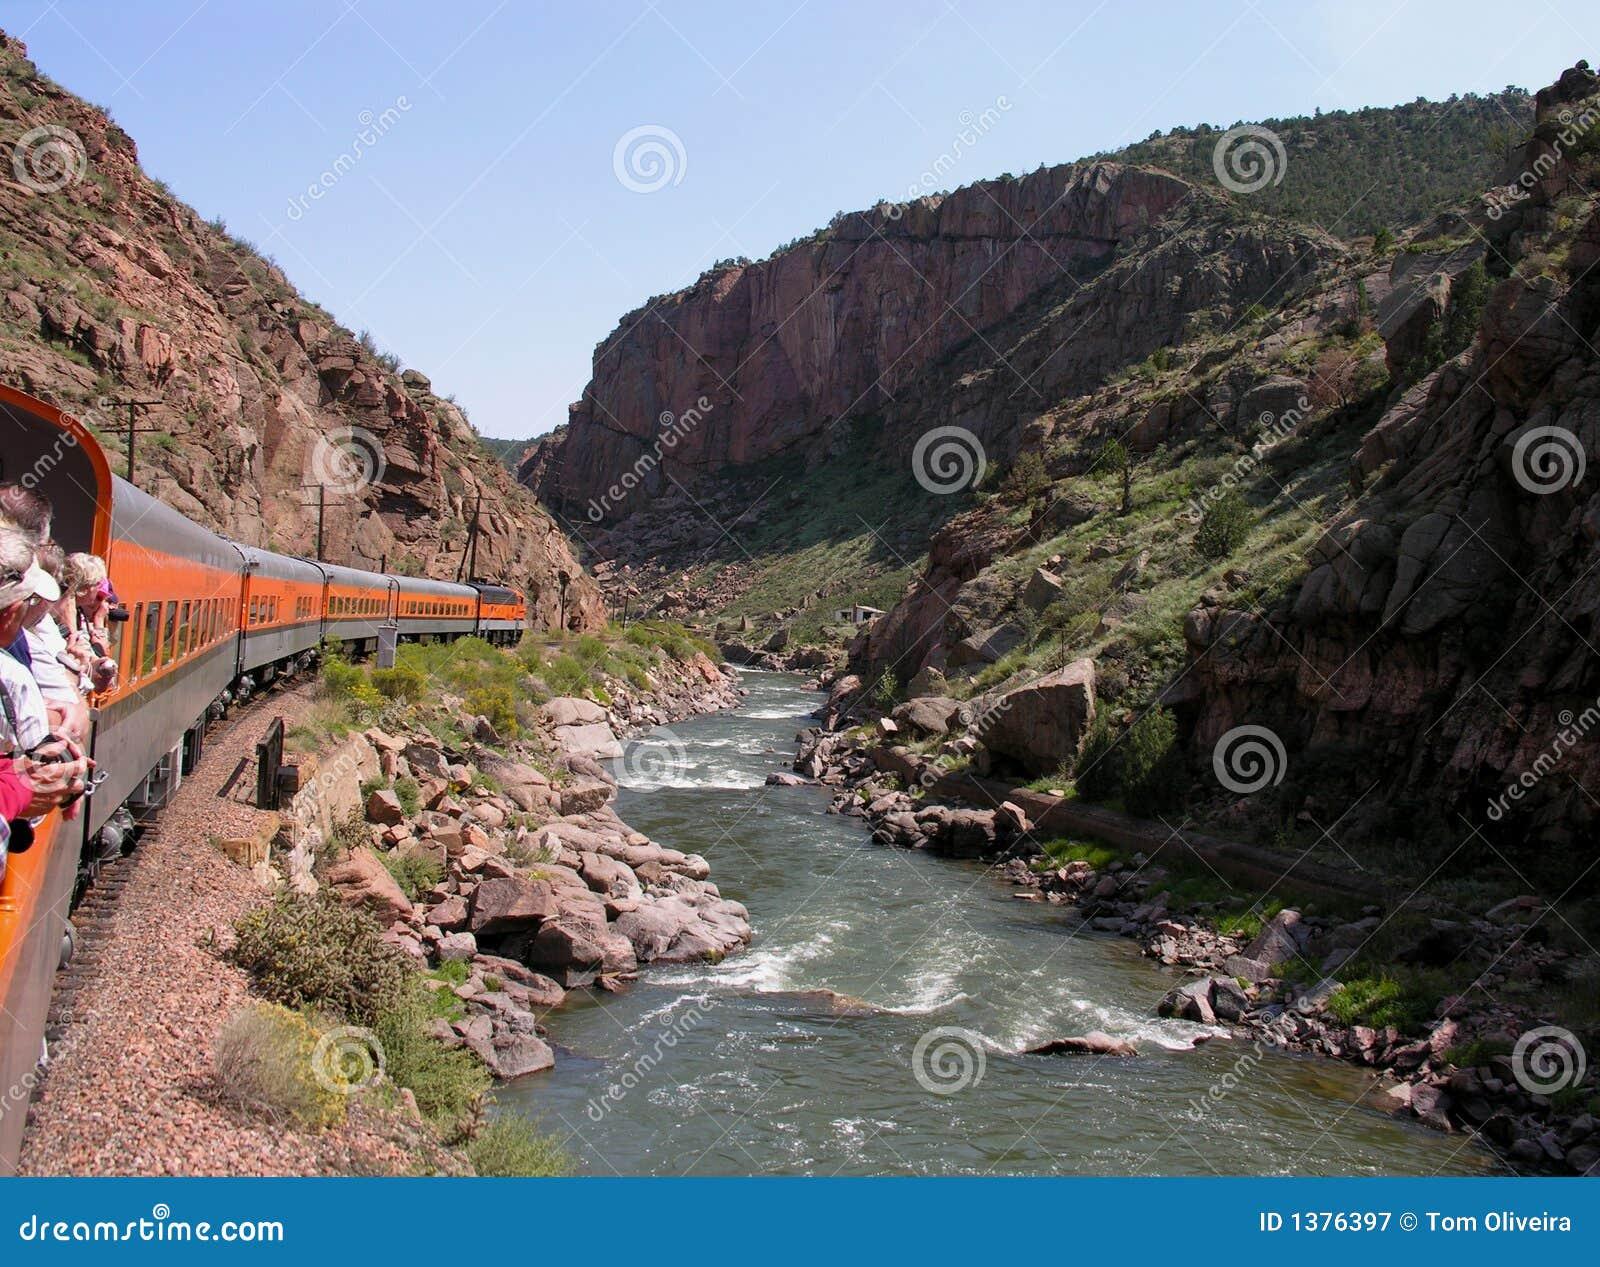 Turista en el tren